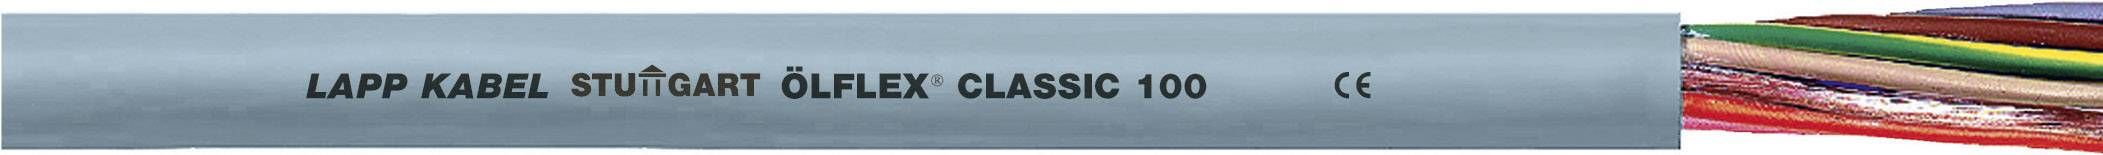 Kabel LappKabel Ölflex CLASSIC 100 4G2,5 (00100883), PVC, 10,7 mm, 750 V, šedá, 50 m